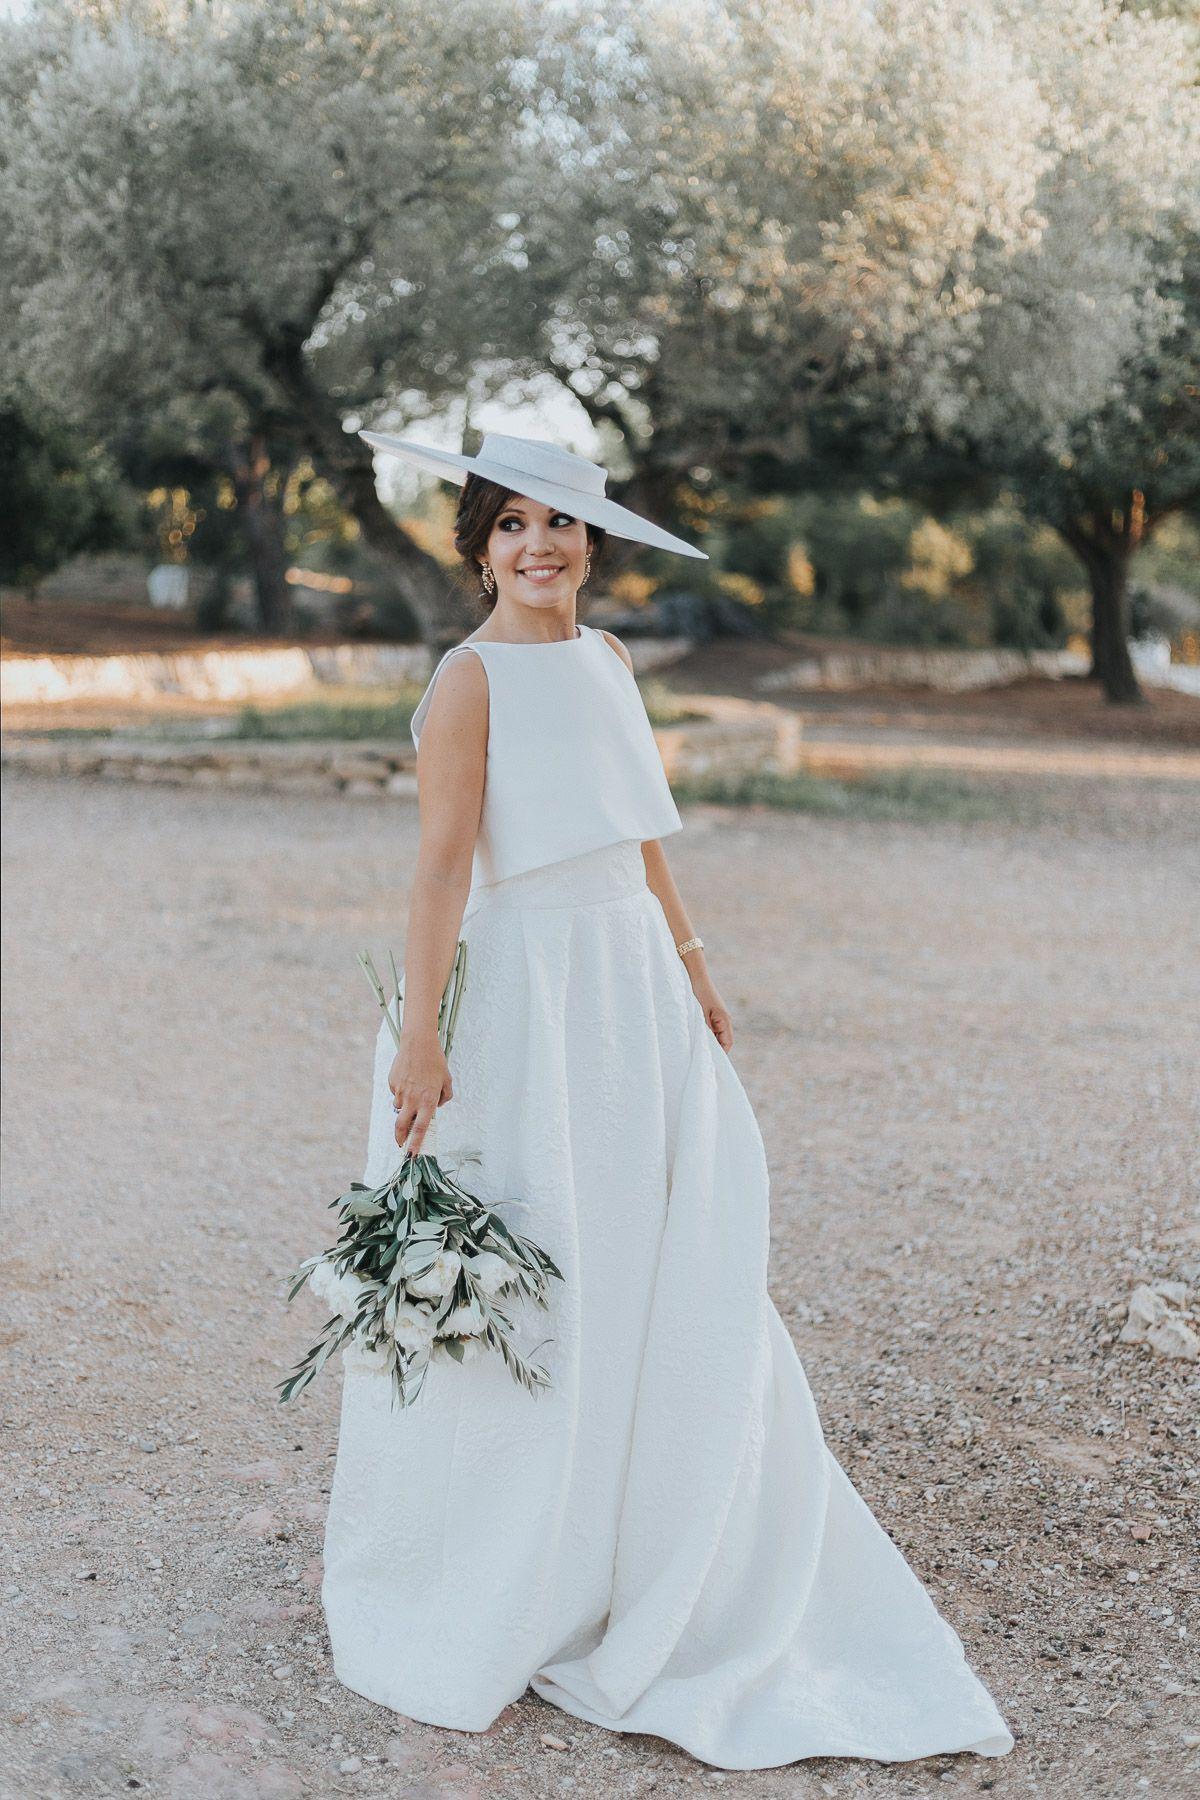 Susana from Spain - JESUS PEIRO bride | vestida de blanco ...